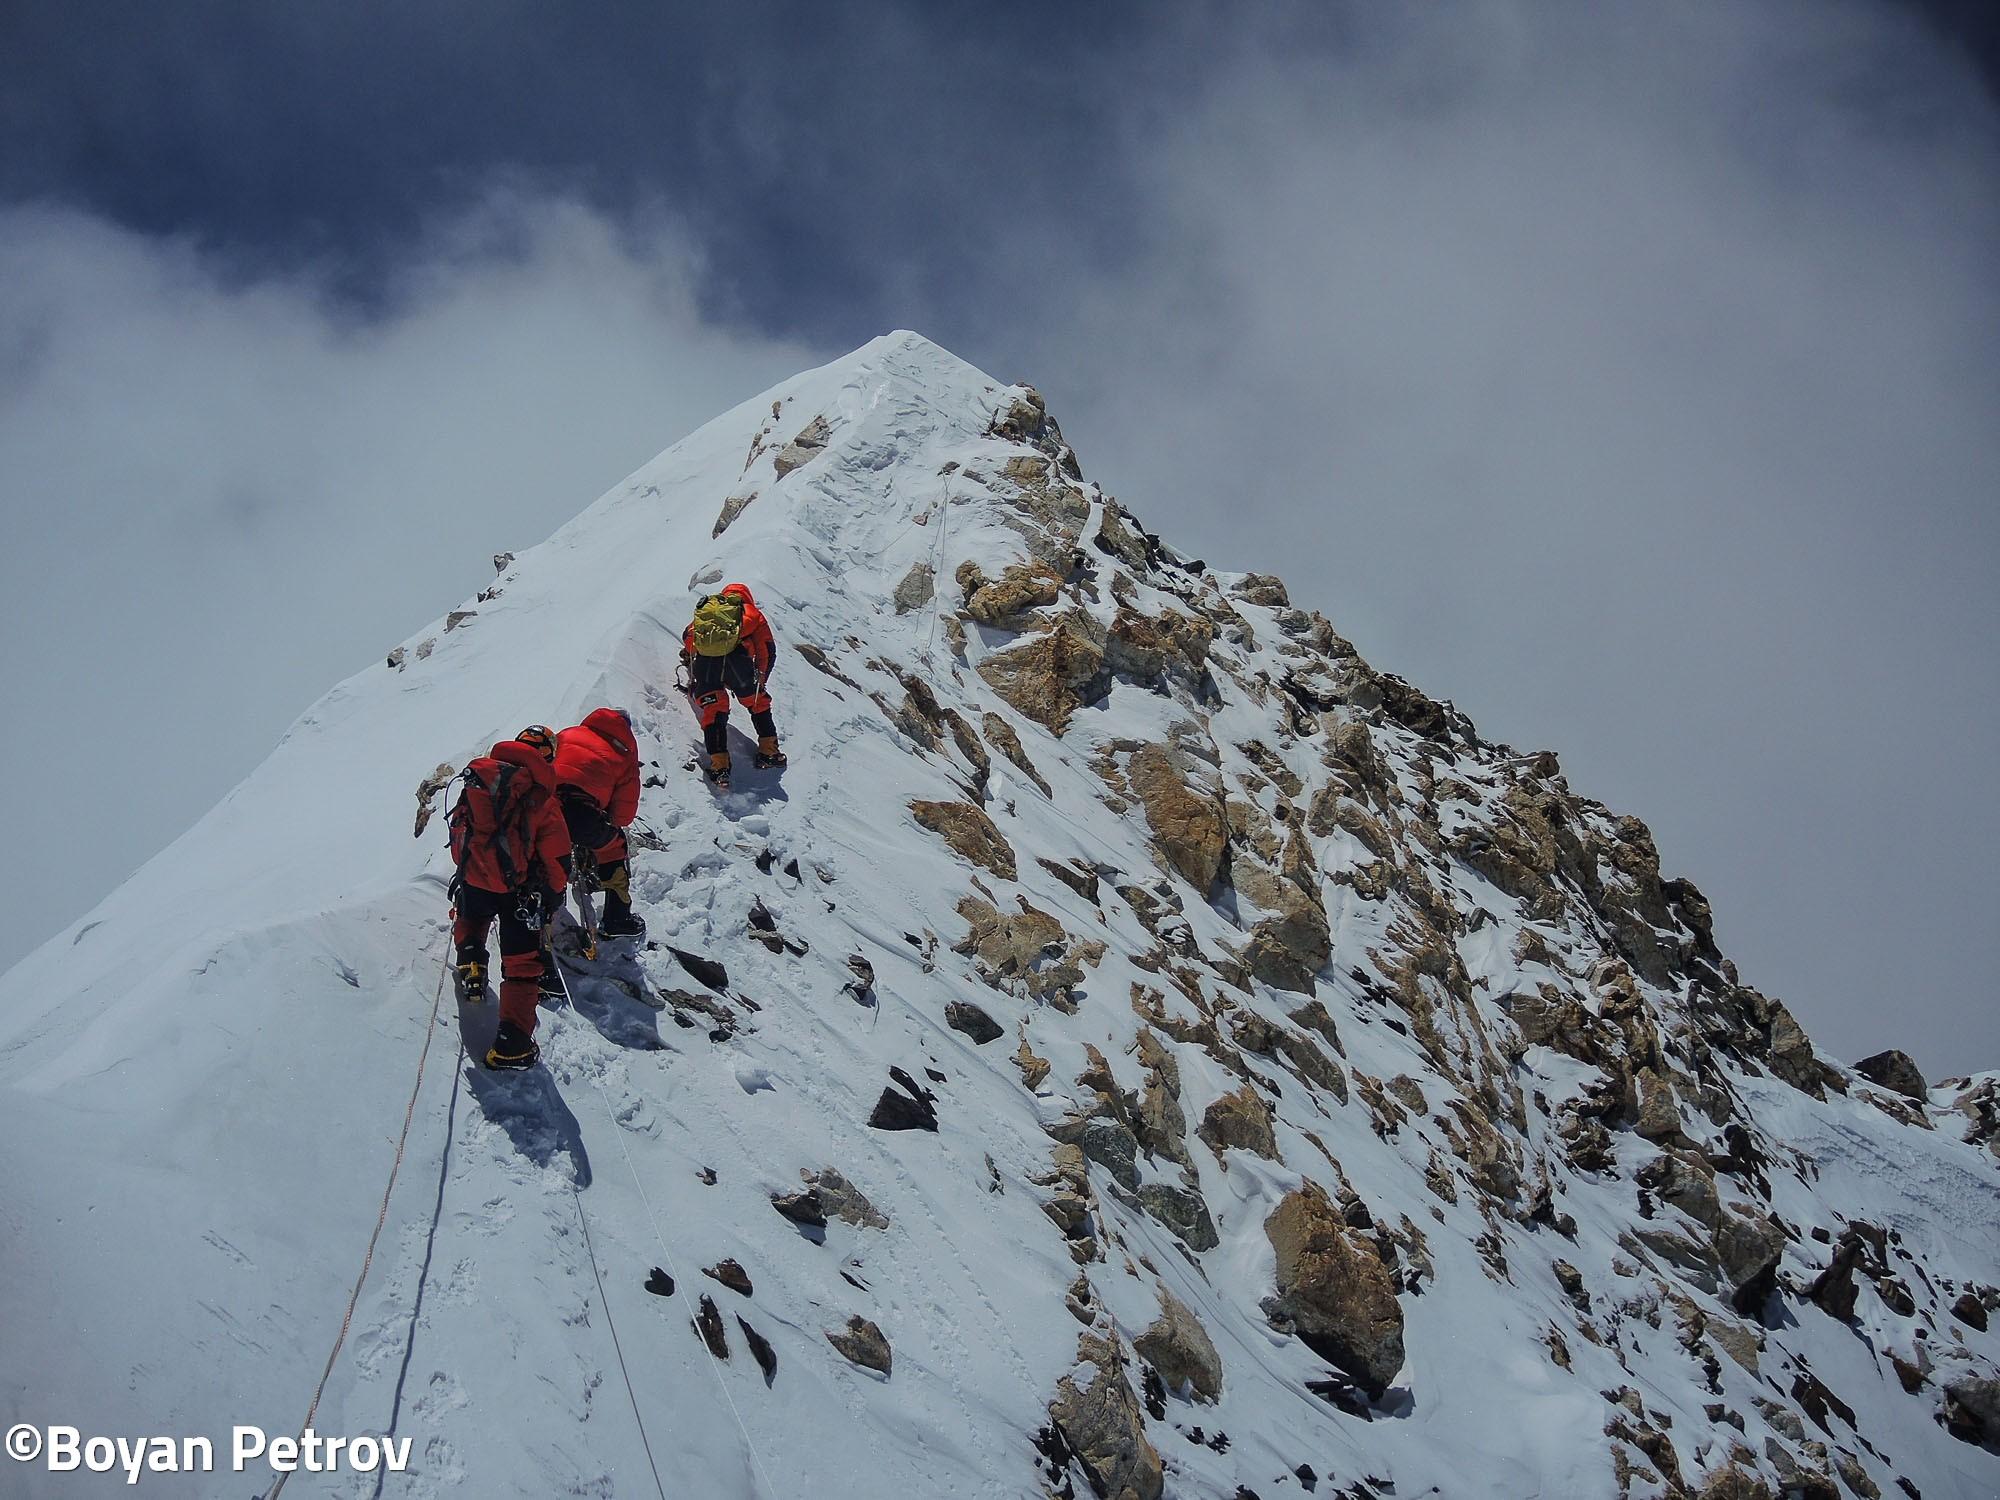 006-A 10 m del Cim-Boyan Petrov